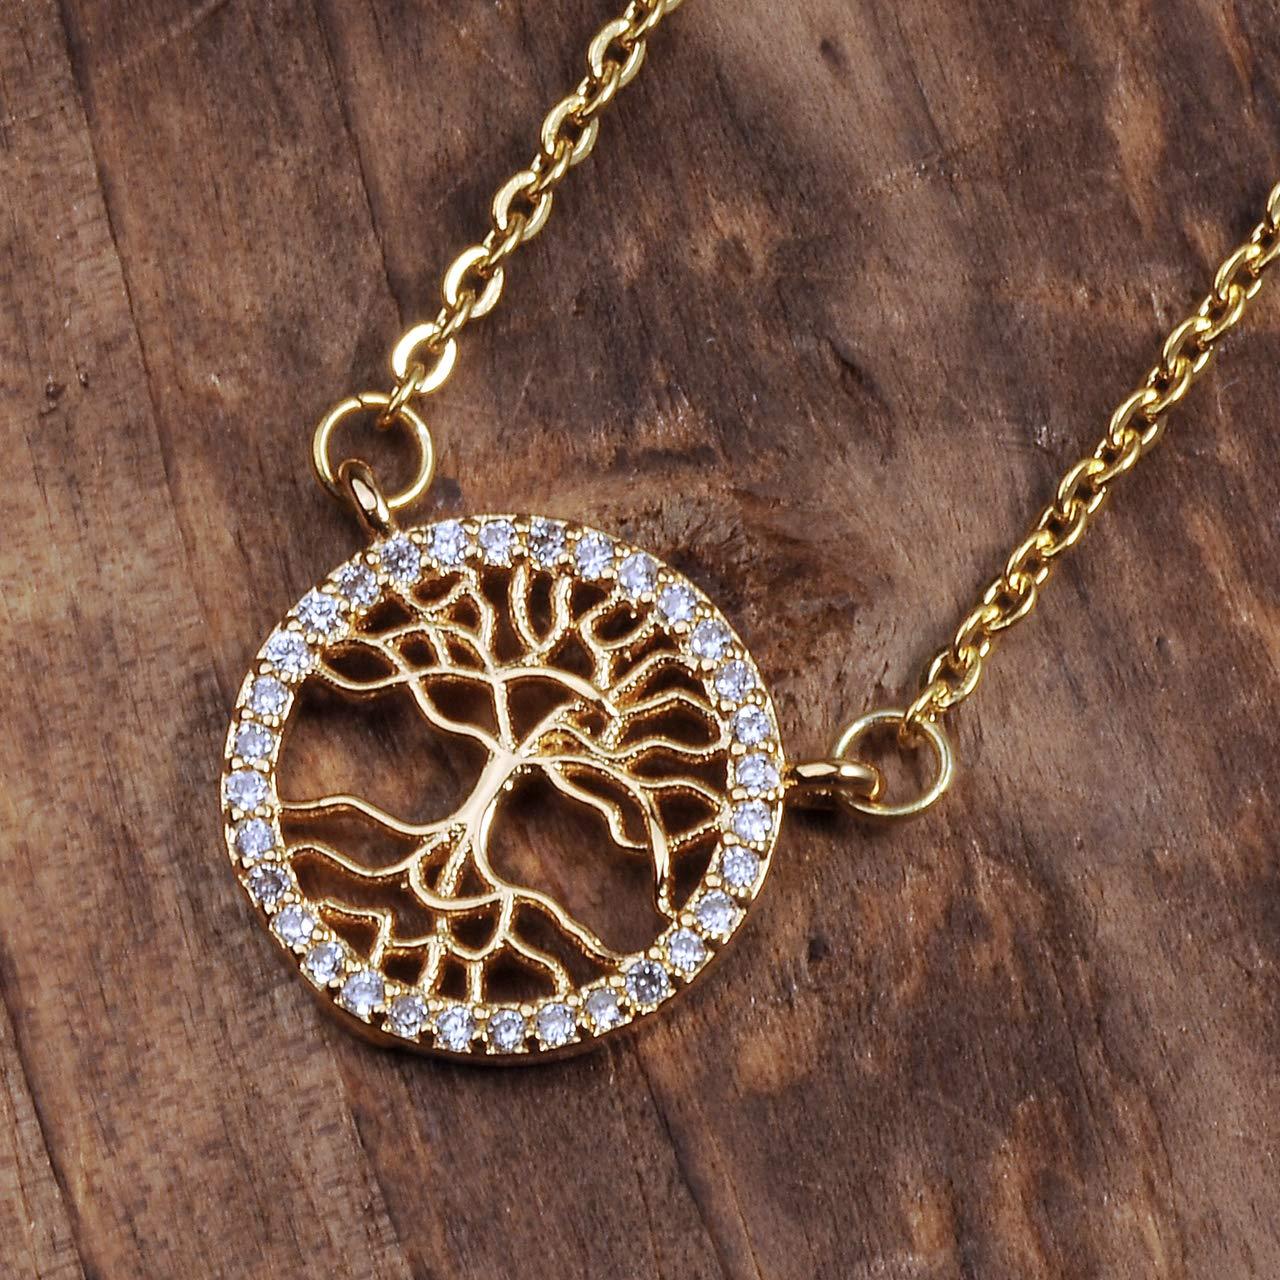 Elegant Jewelry for Women Girls MANIFO Crystal Rhinestone Tree of Life Pendant Necklace